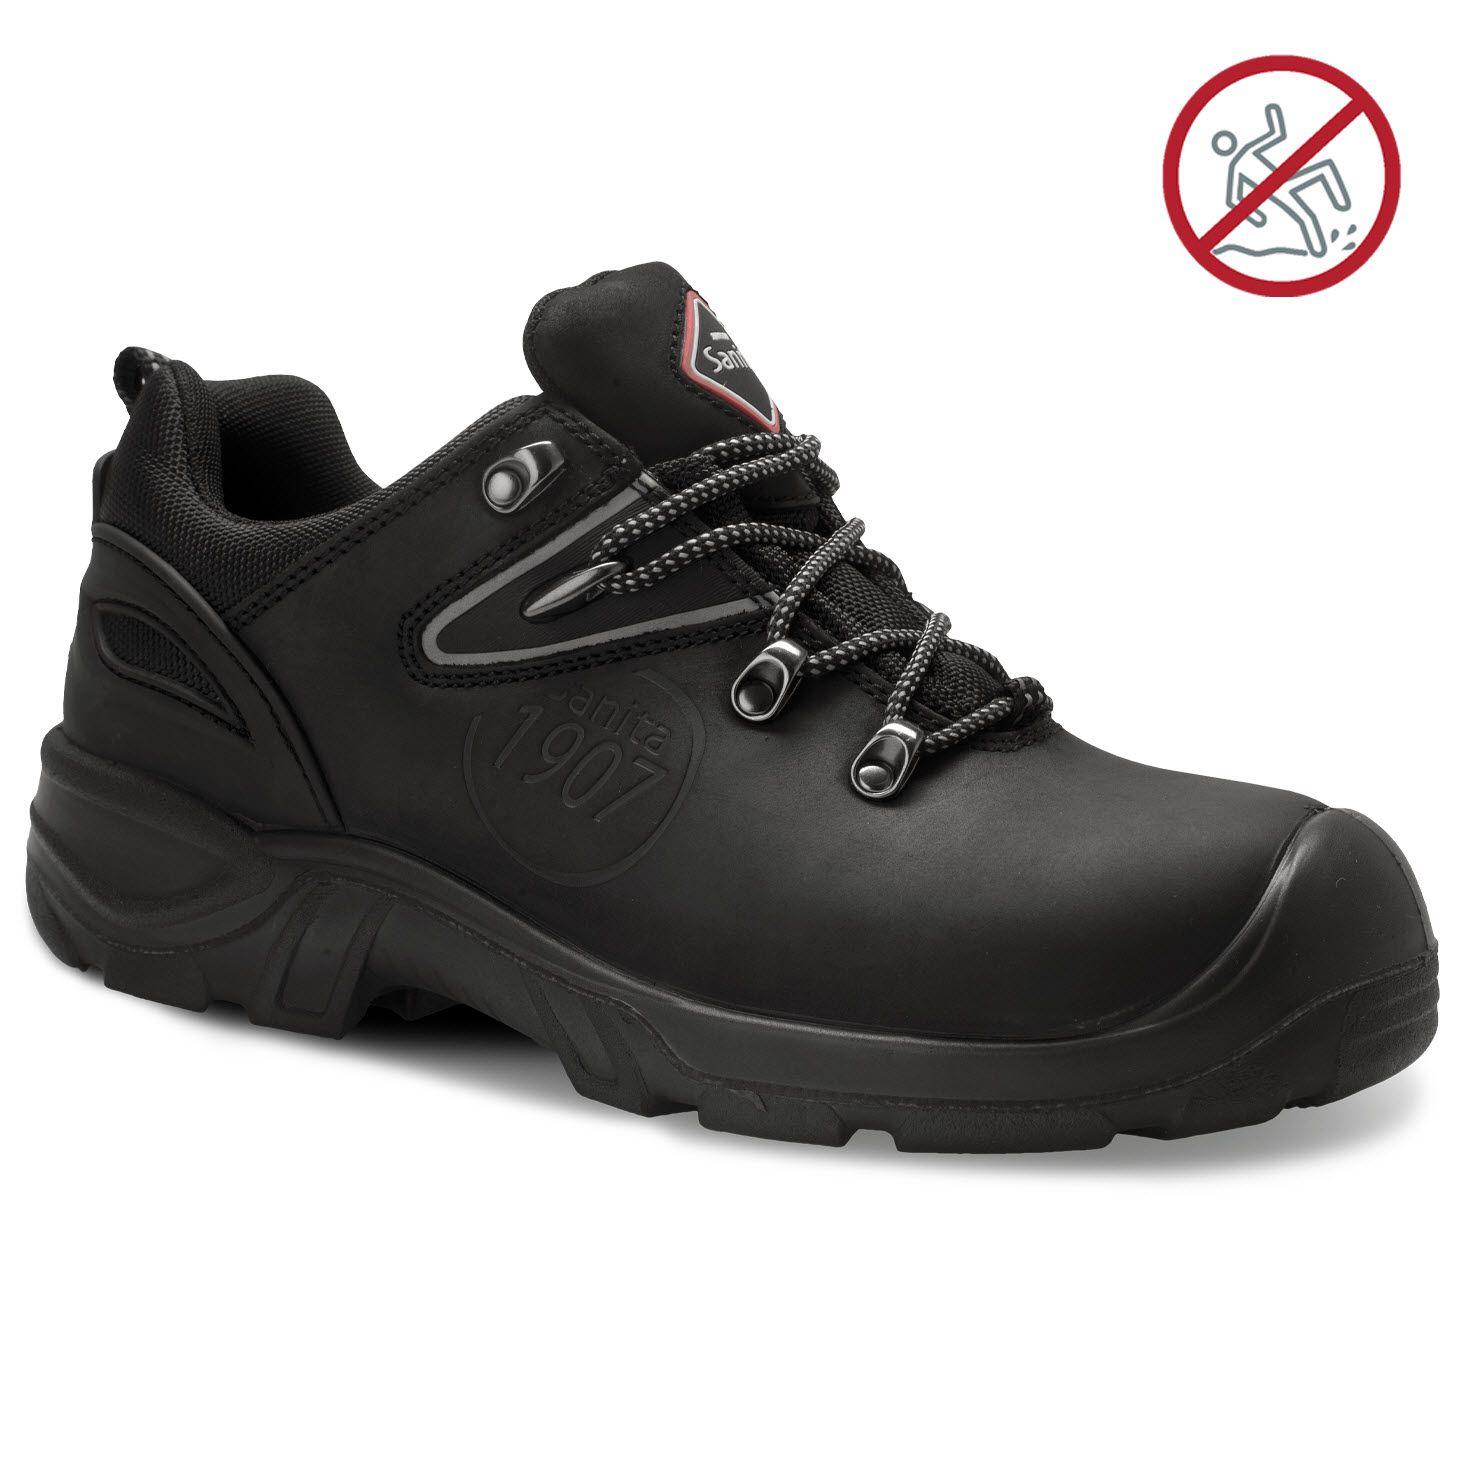 AMAZON Unisex Safety Boot-Sanita